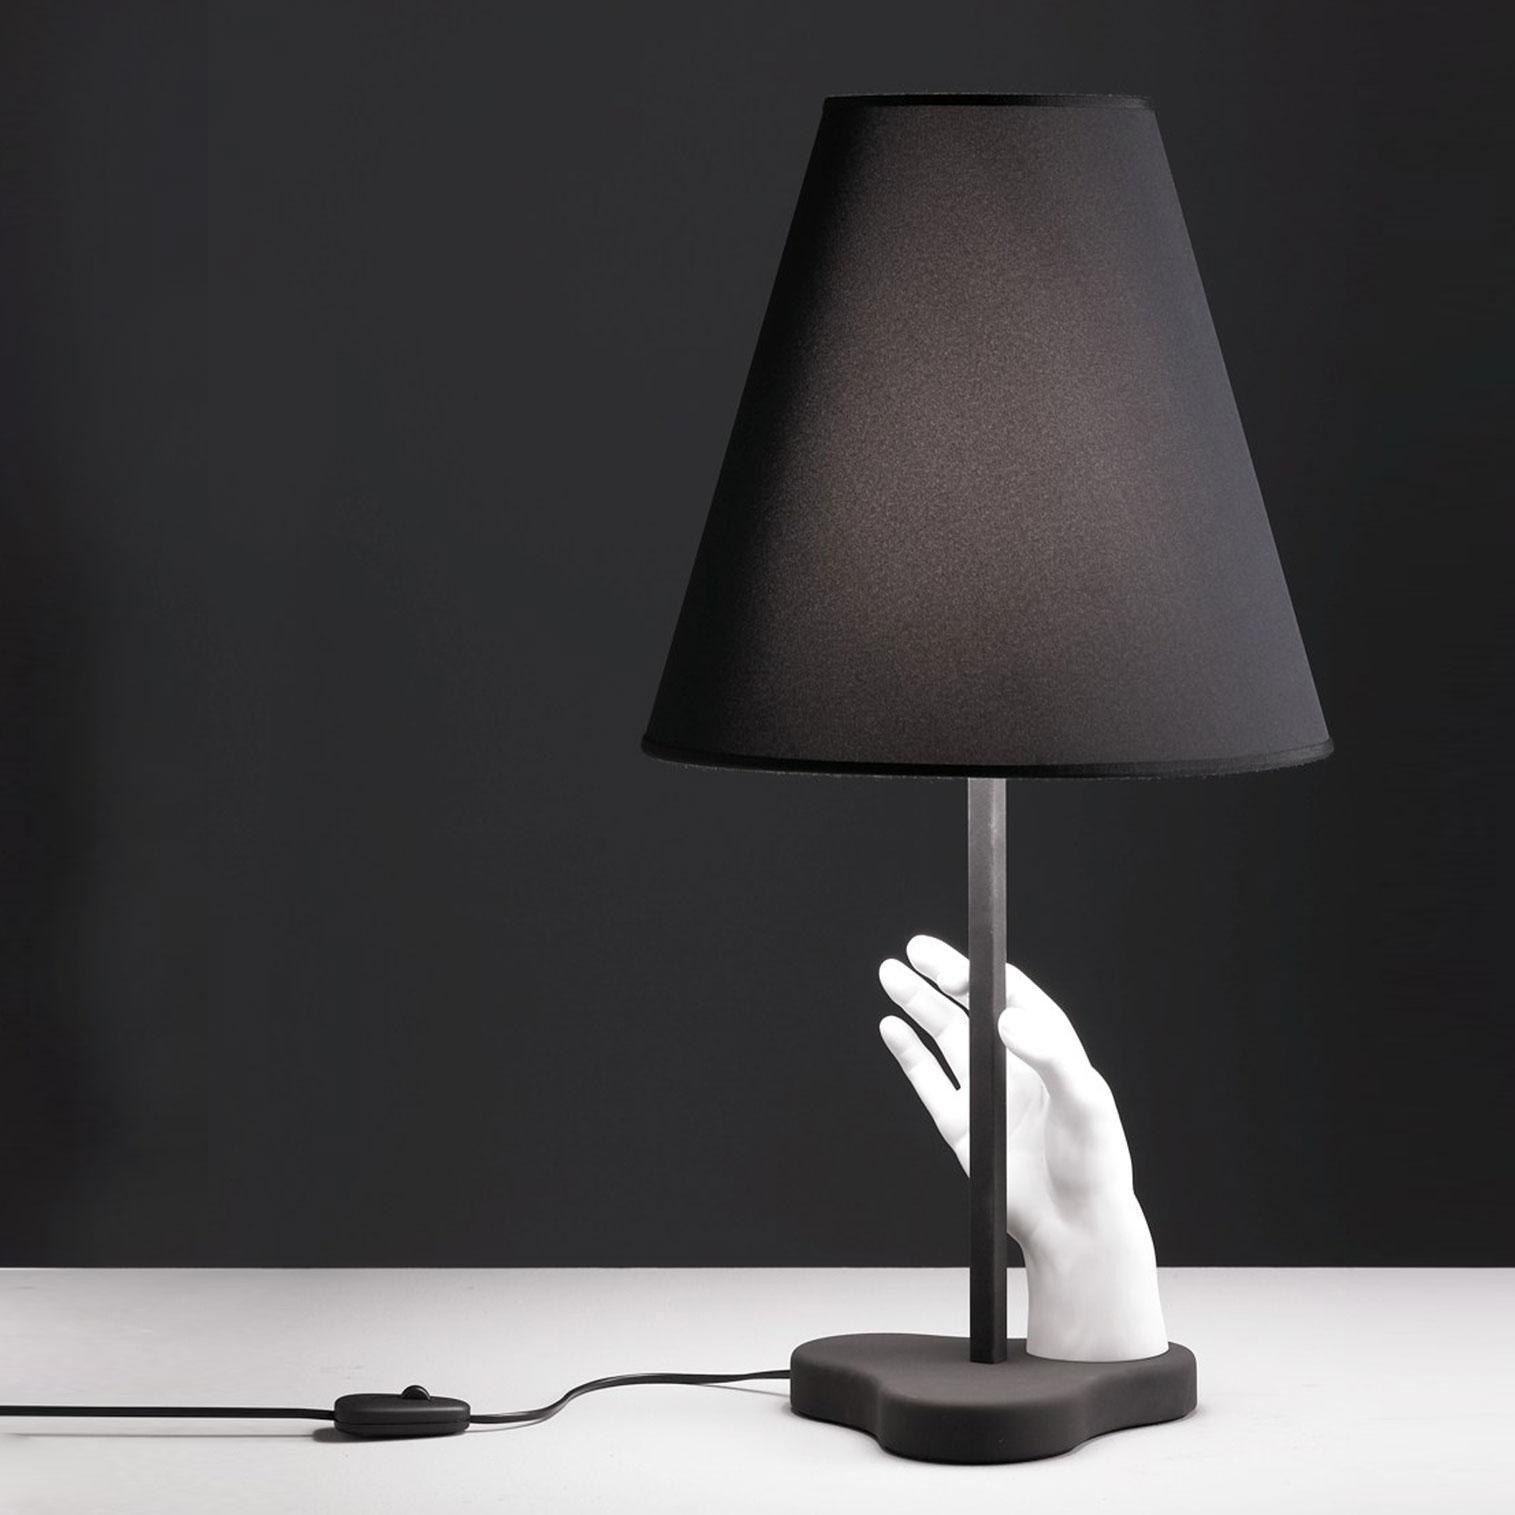 fontana arte mano lampe du table ambientedirect. Black Bedroom Furniture Sets. Home Design Ideas